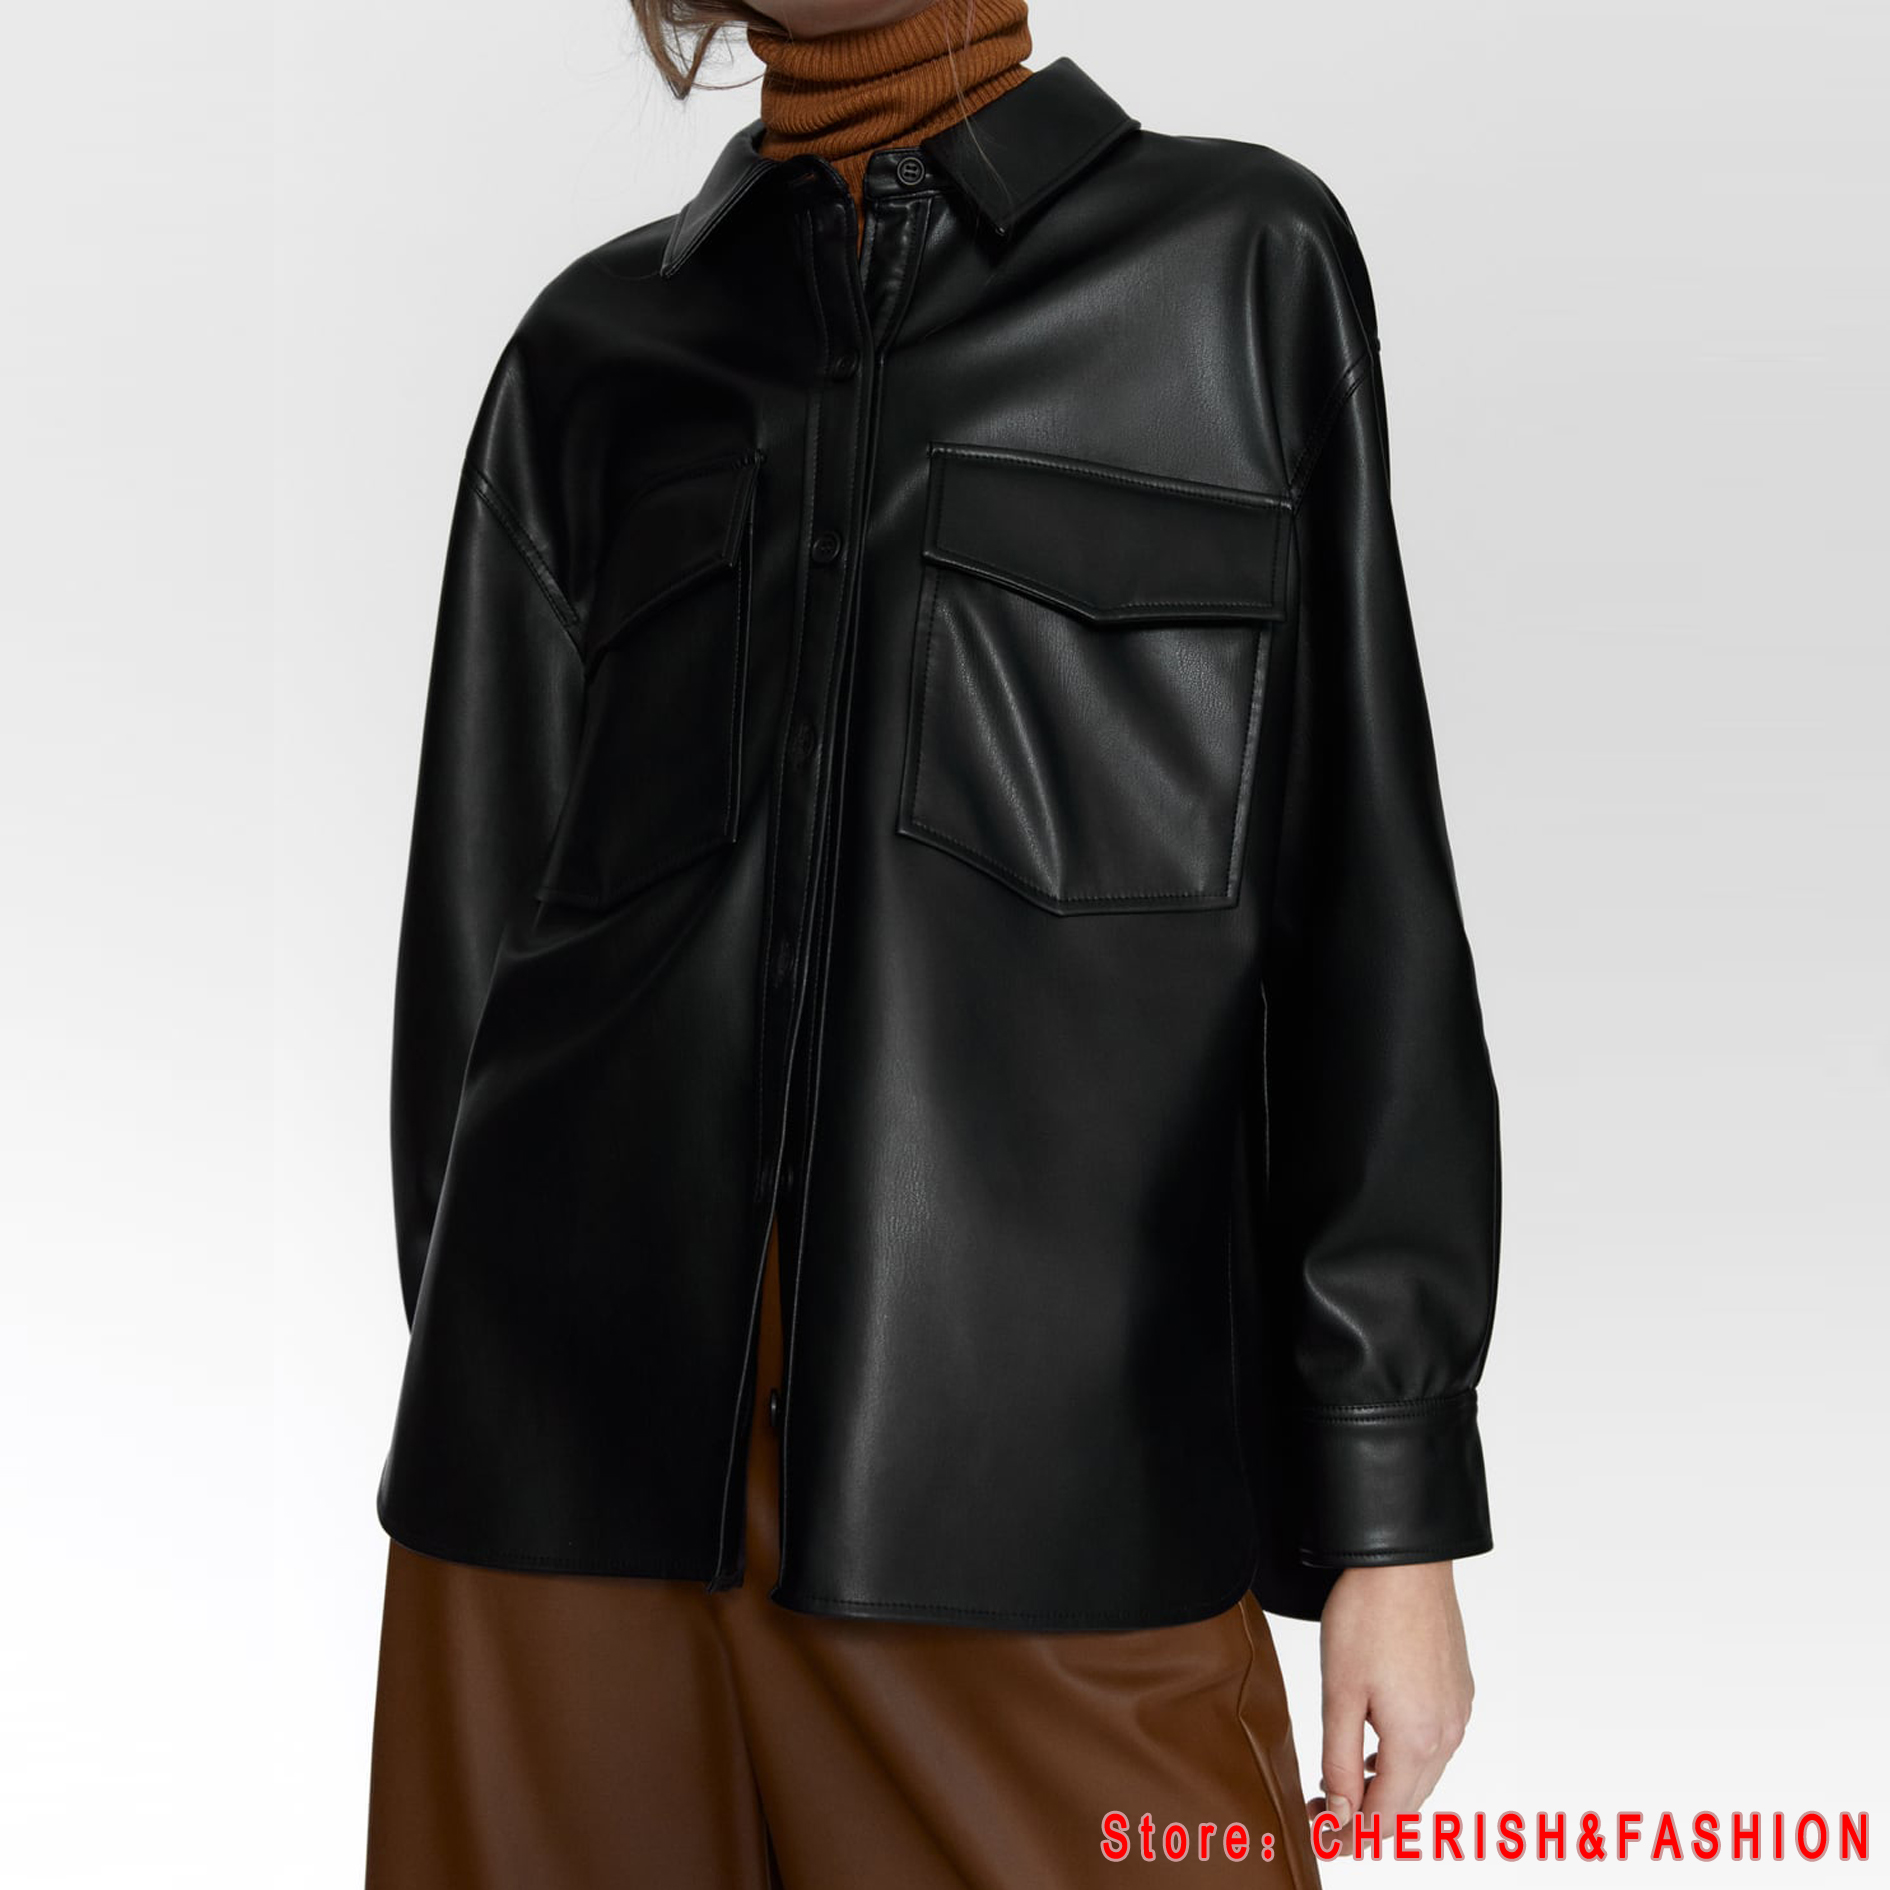 2020 New Winter Temperament Business Blouses Women Fashion PU Leather Dress Women Elegant Long Sleeve Tops Black Female Ladies